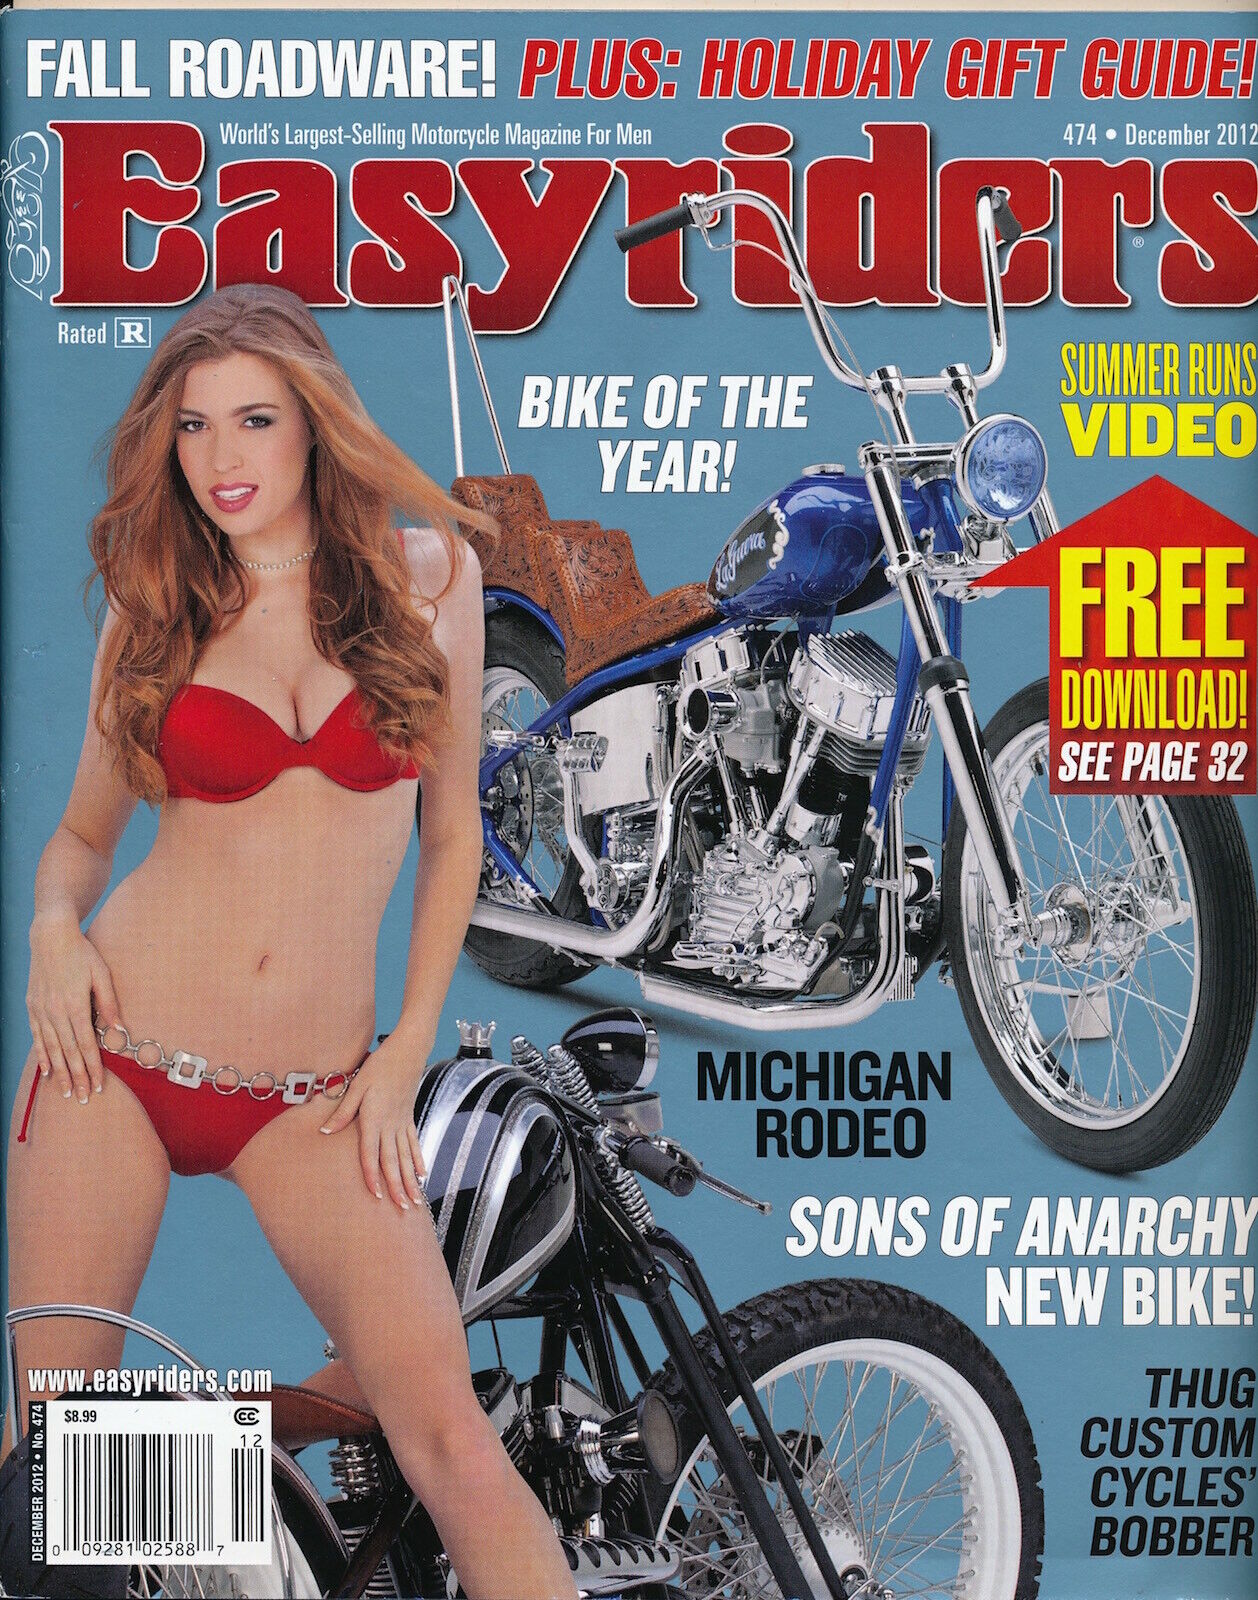 EASYRIDERS December 2012 Vintage Magazine CUSTOM Leather Hot Motorcycles 127009 - $2.00